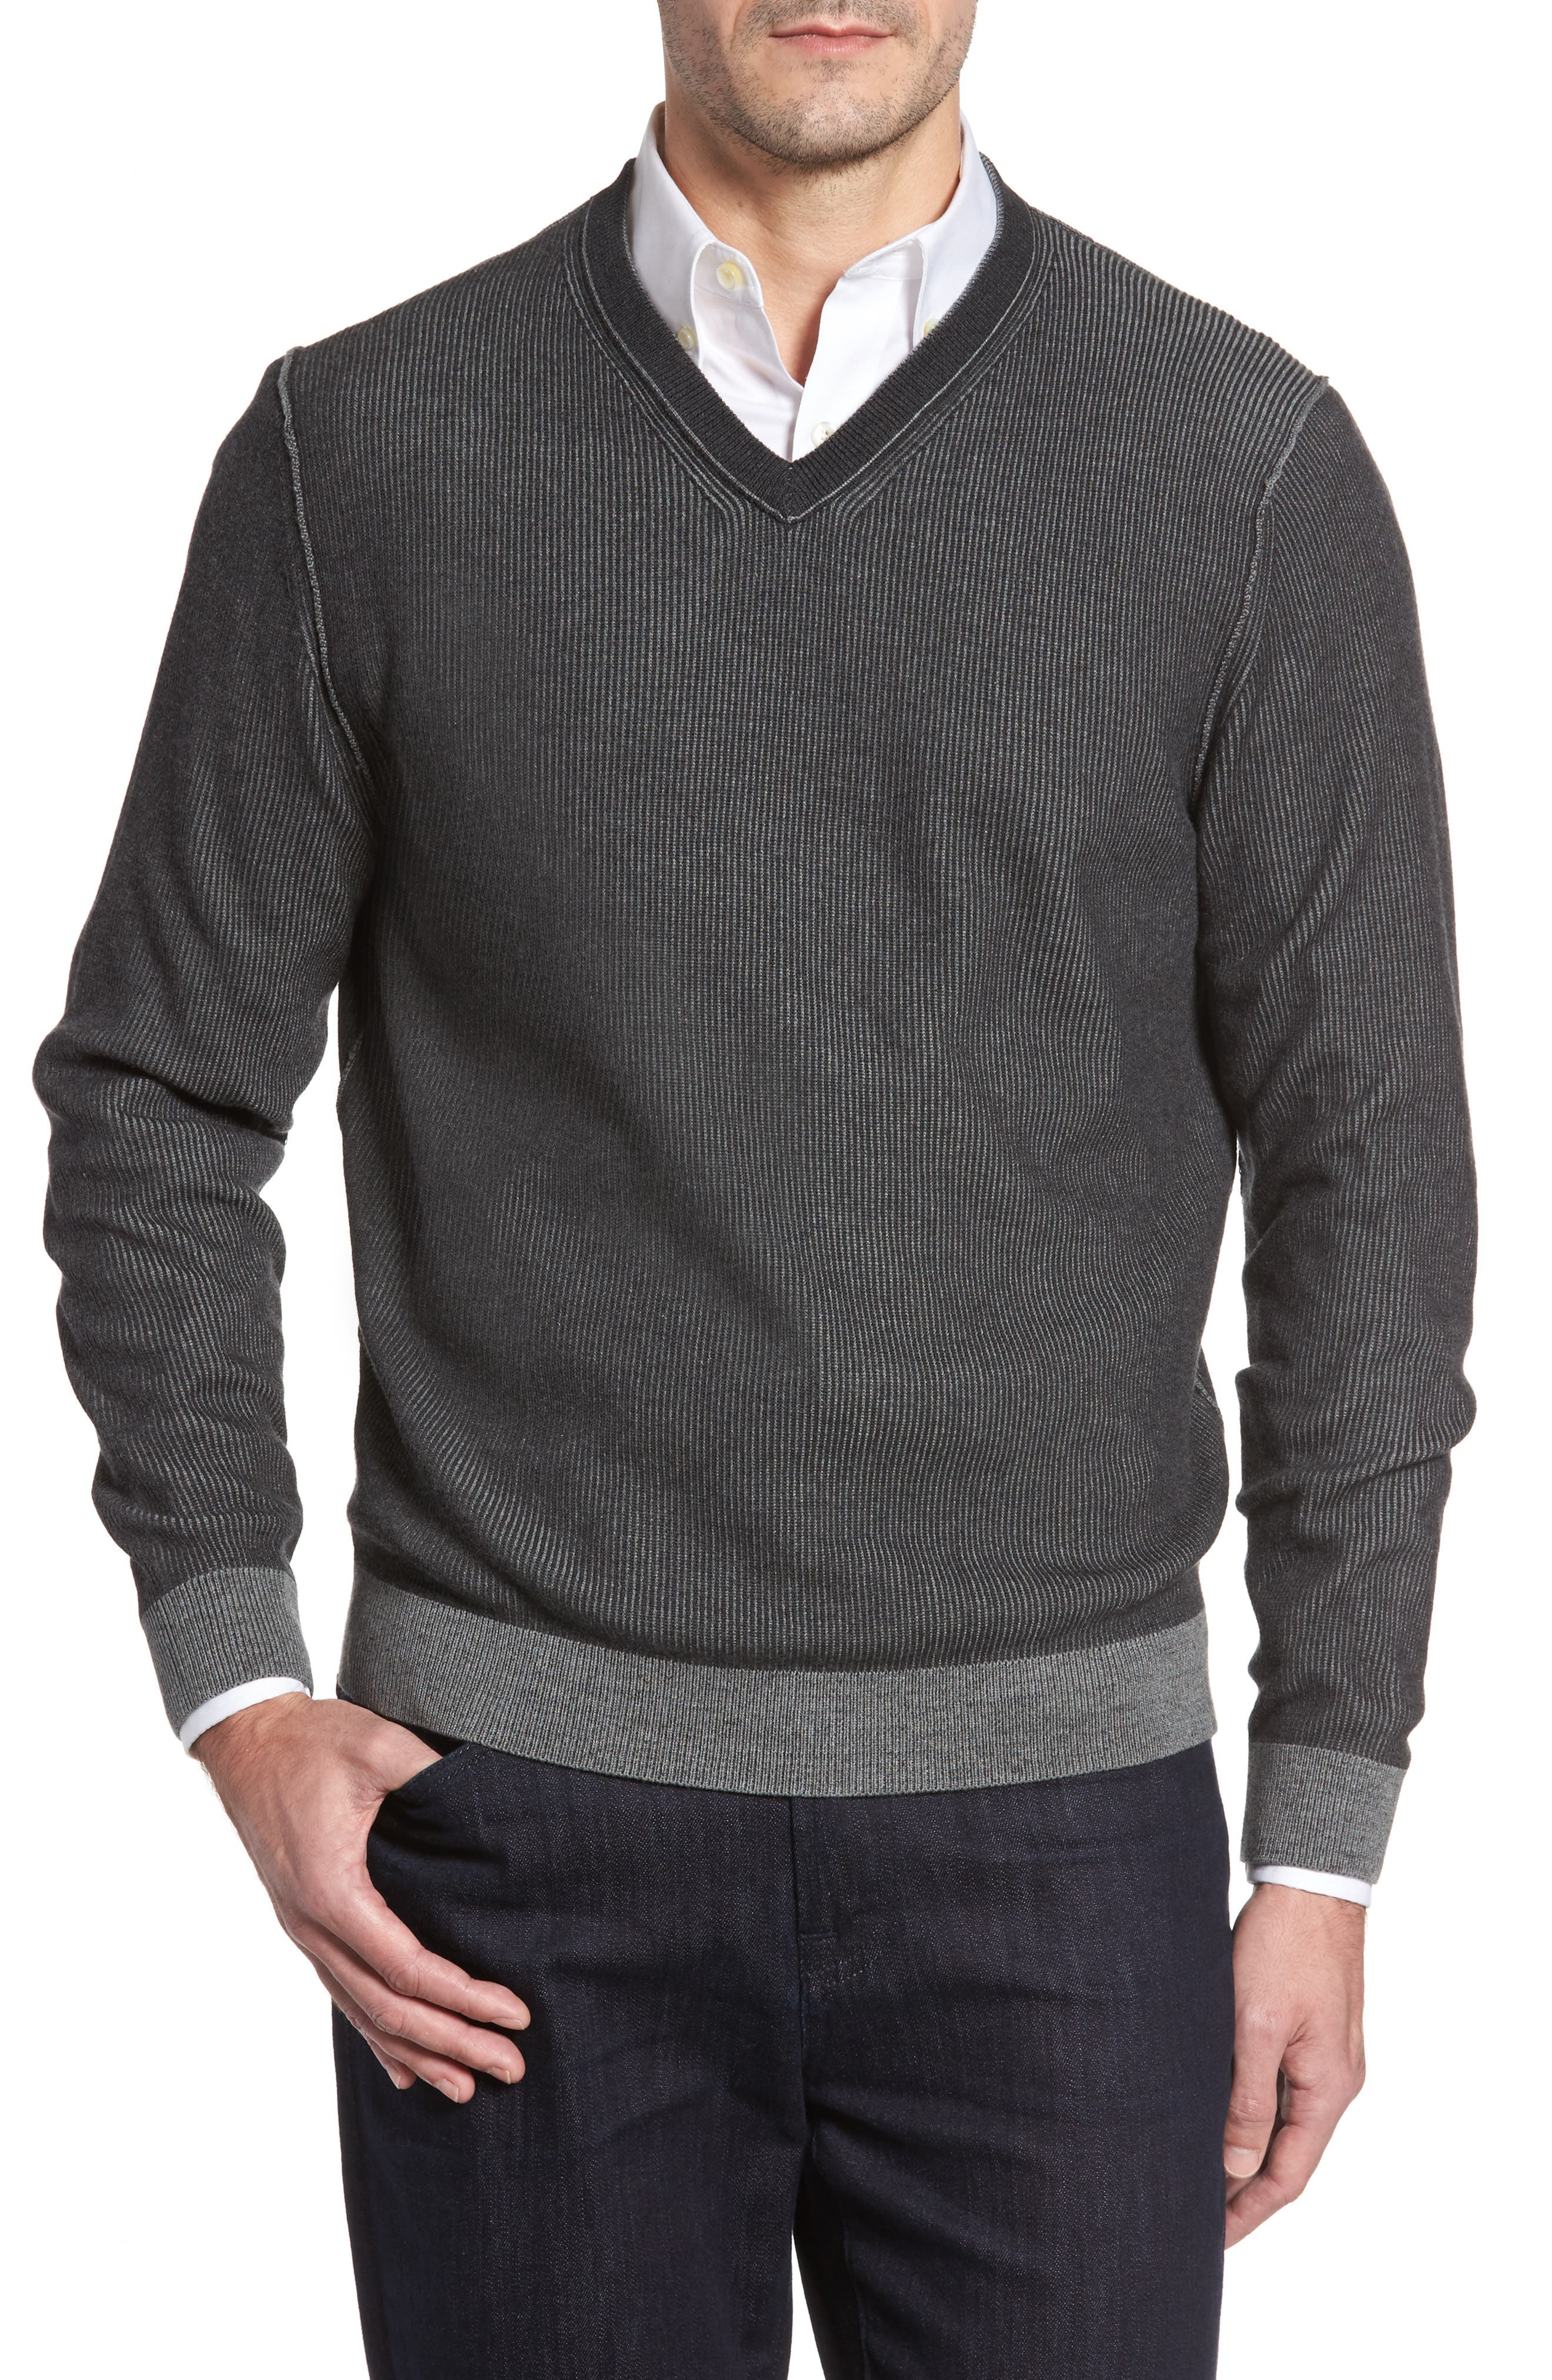 Las Palmas Reversible Sweater,                             Alternate thumbnail 6, color,                             Charcoal Heather